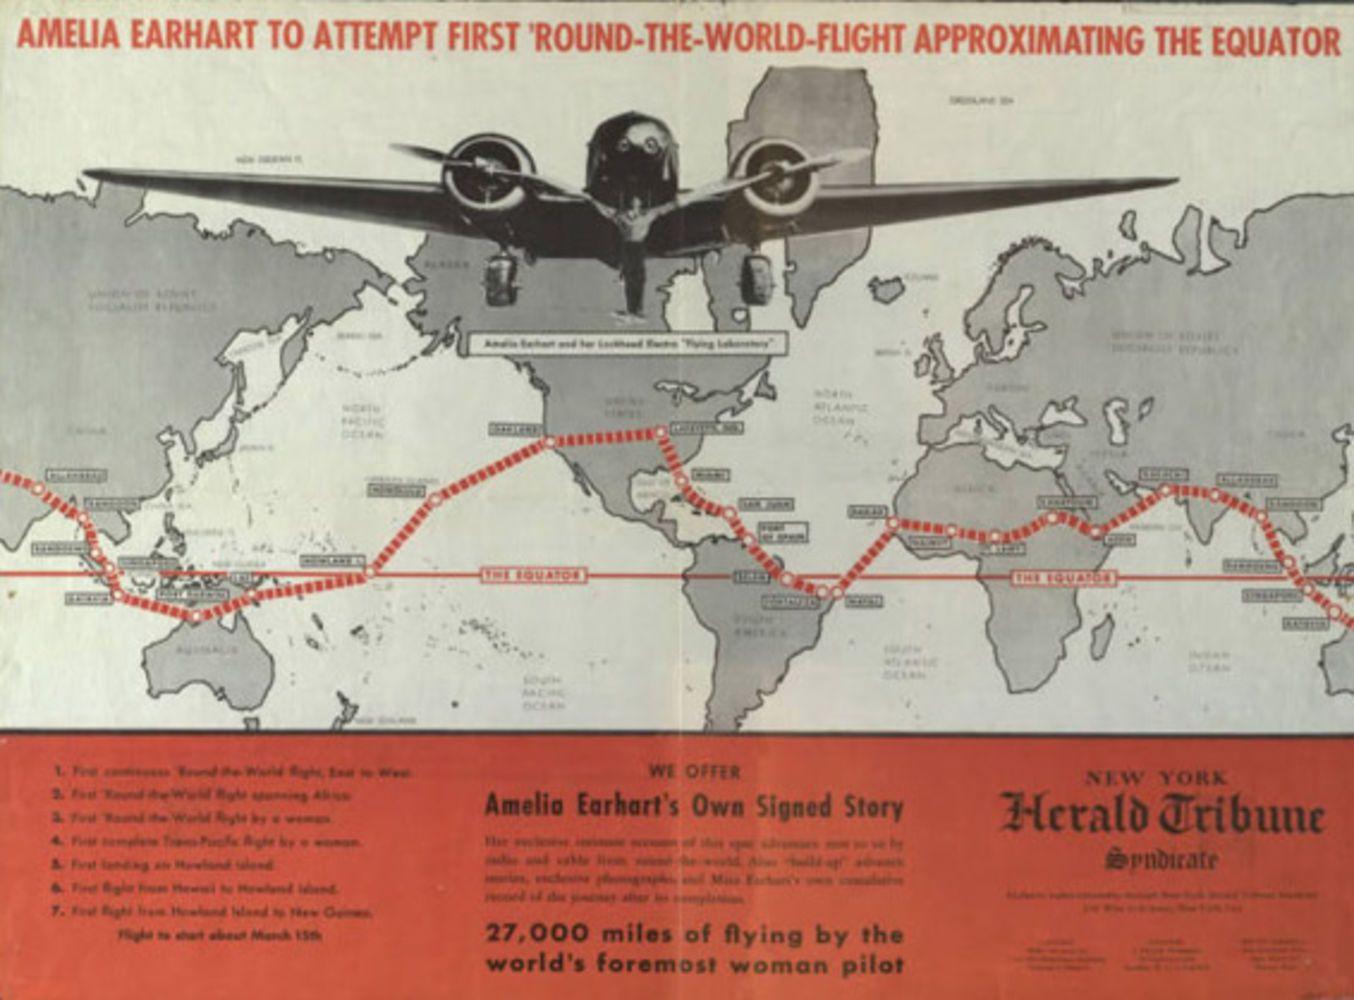 Amelia Earhart Biography Pilot Biography Com Amelia Earhart Amelia Earhart Biography Amelia